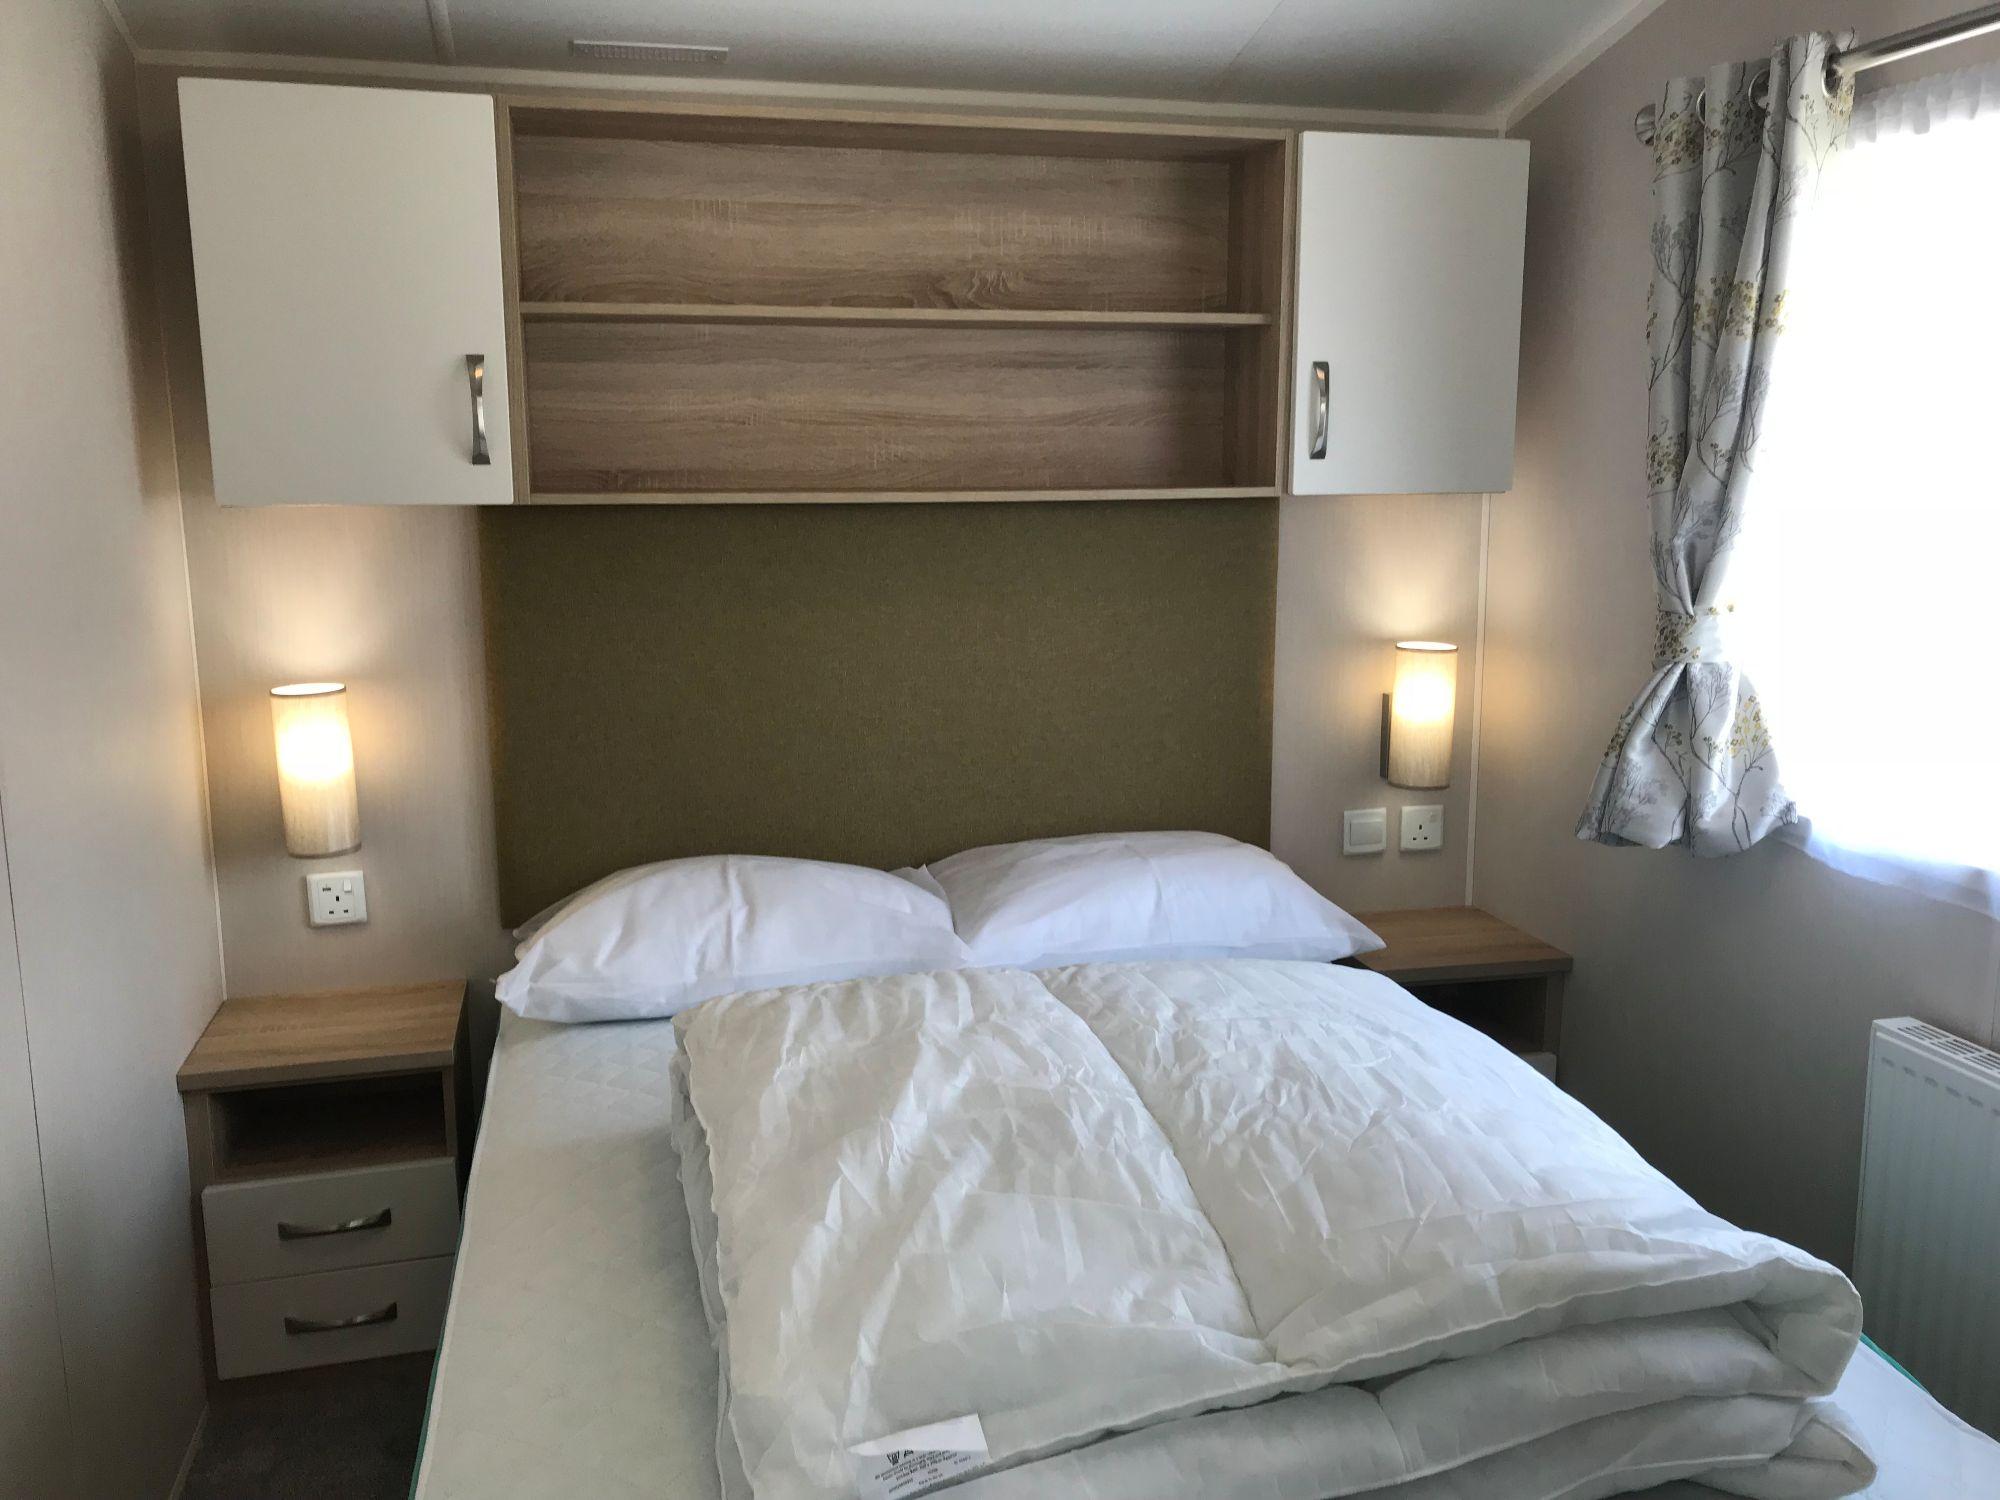 Butlins Caravans accommodation